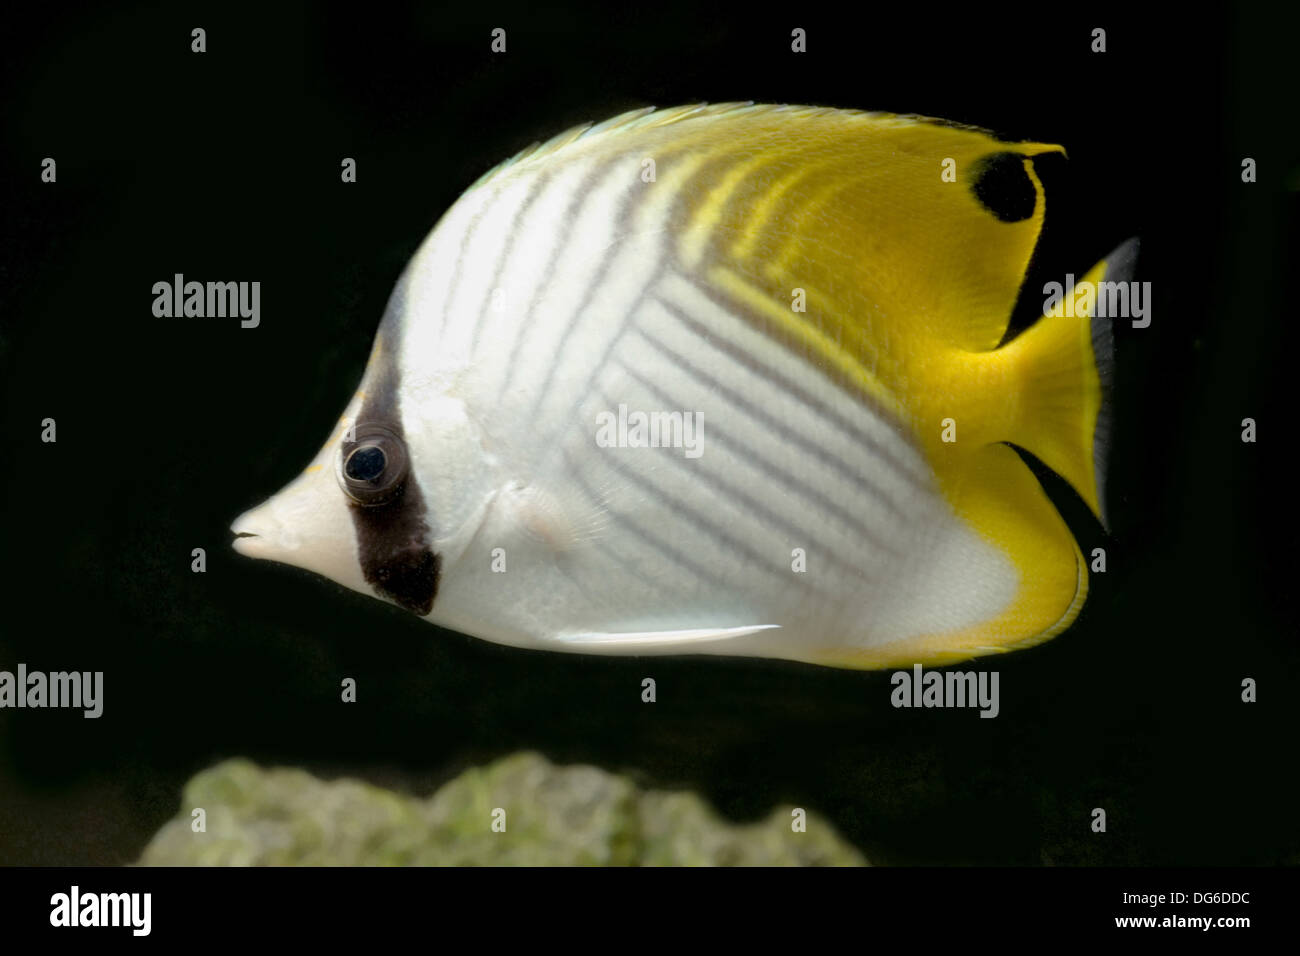 threadfin butterflyfish, chaetodon auriga - Stock Image